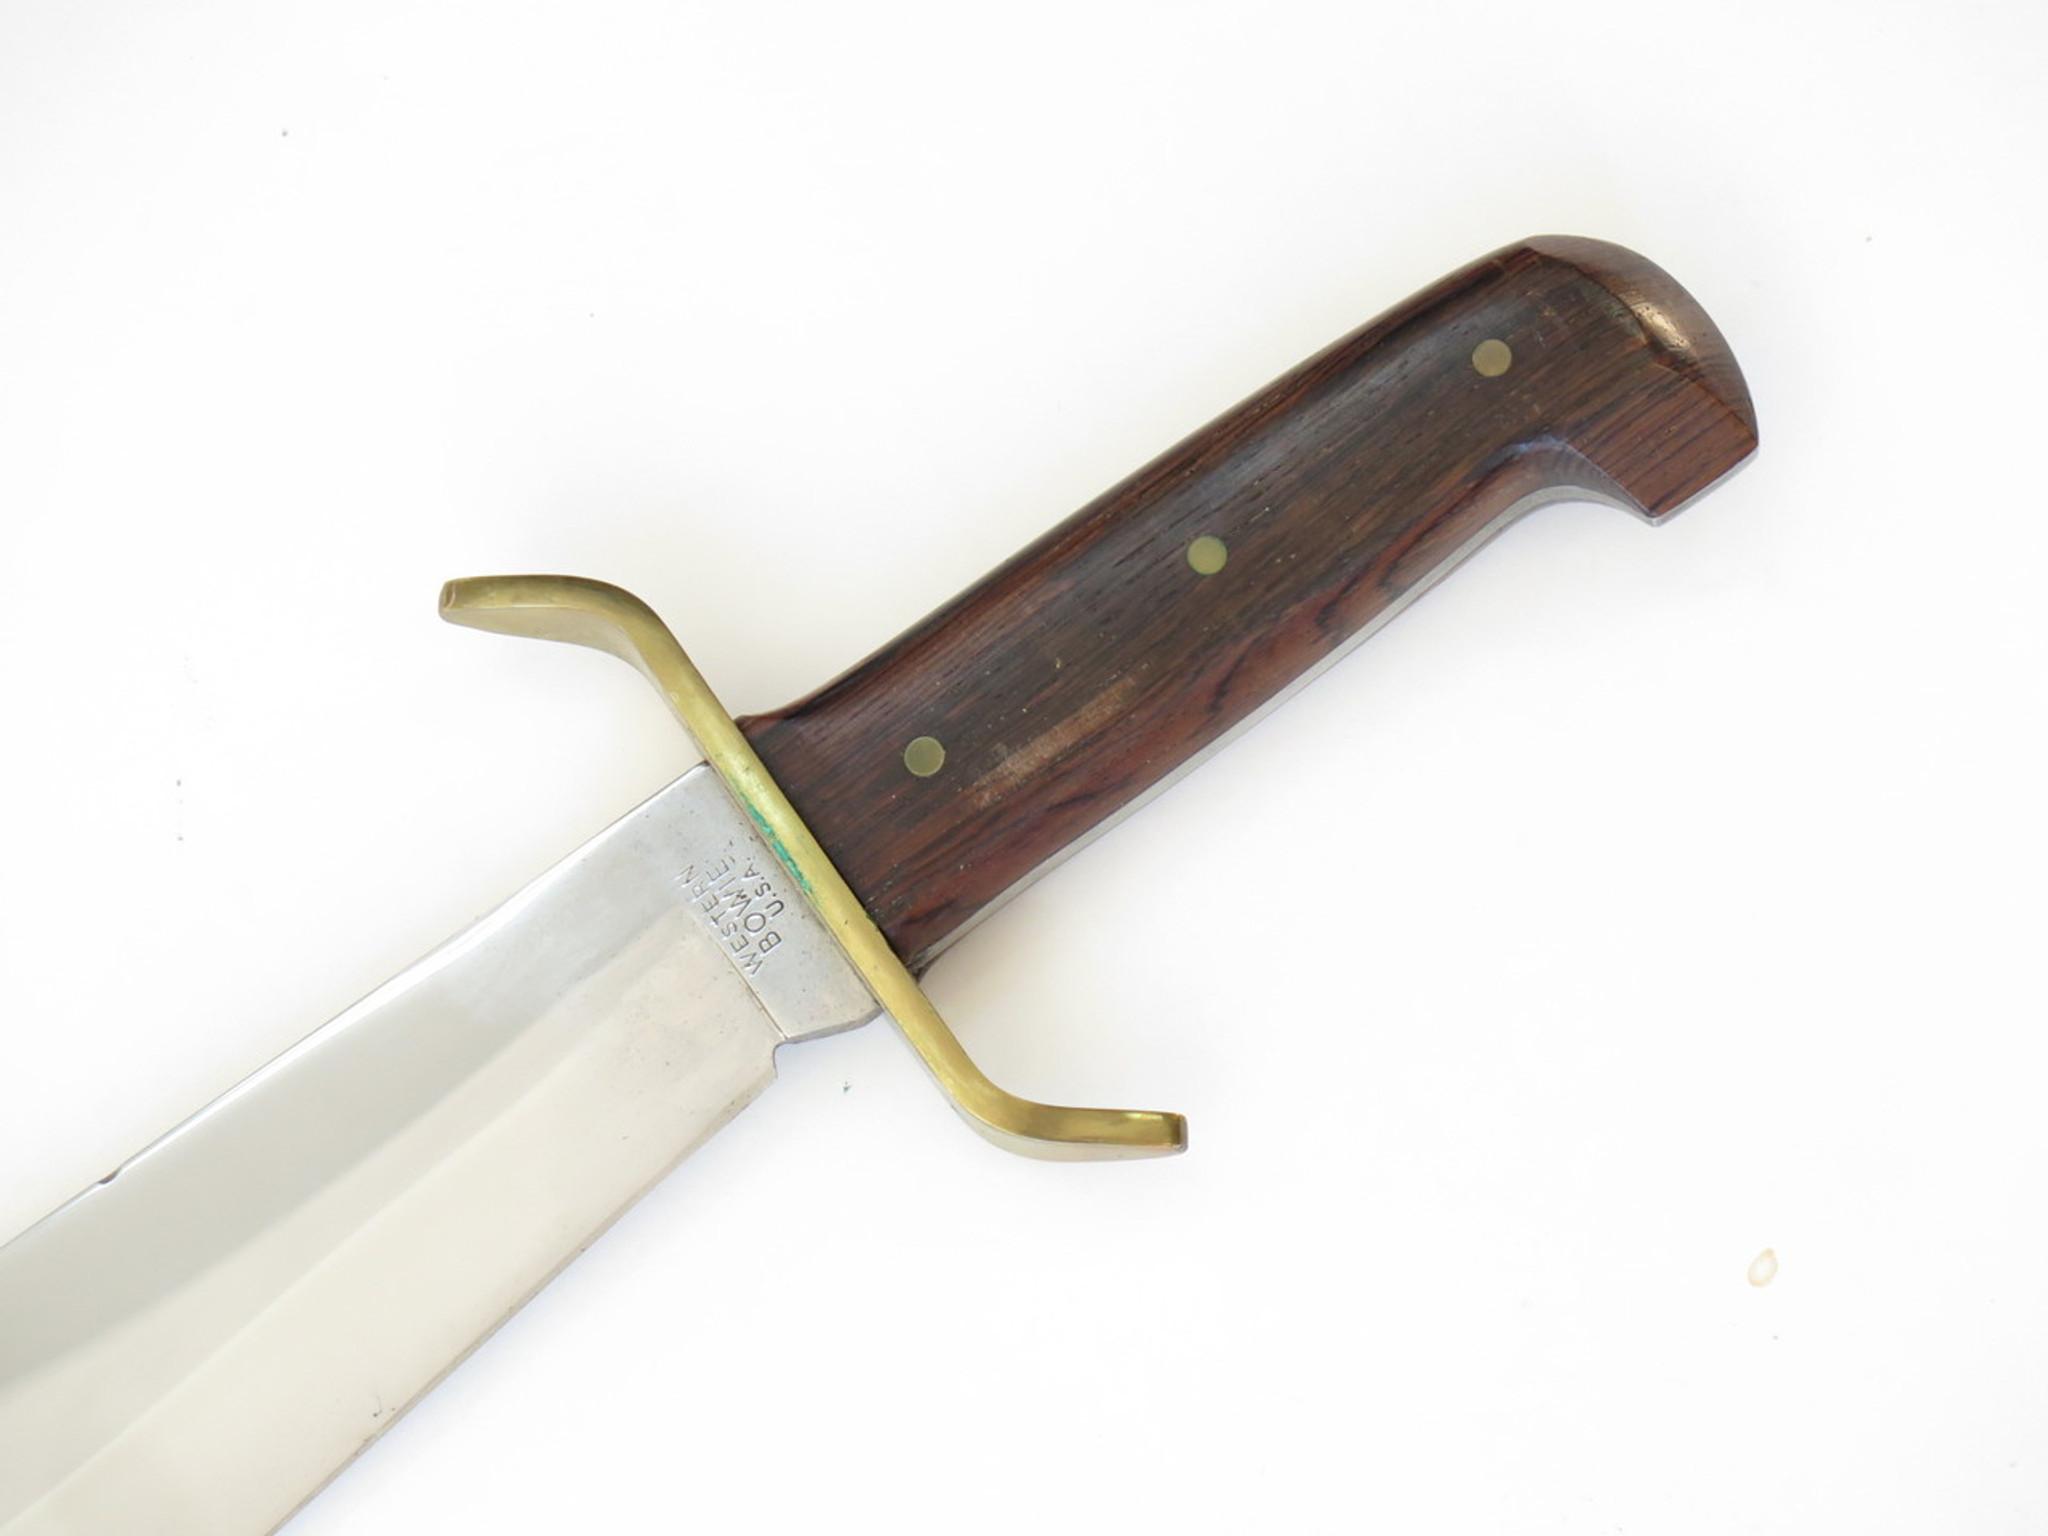 western bowie knife history